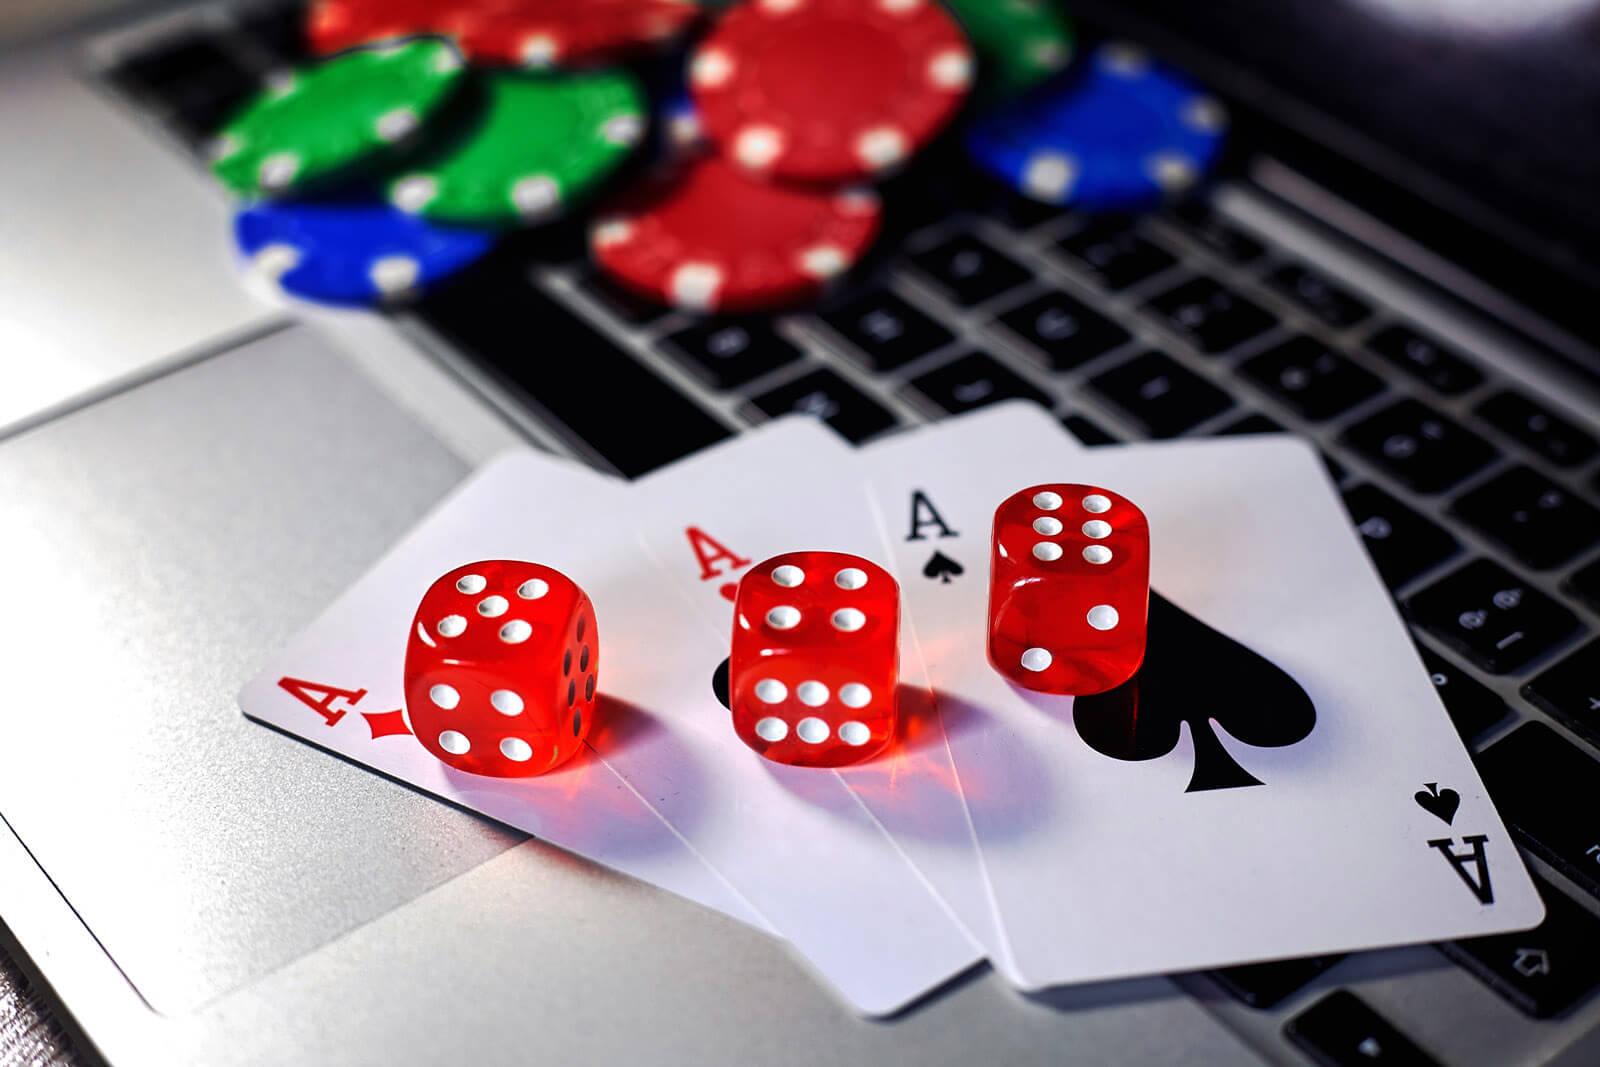 Laptop Casino Gambling Aces Dices